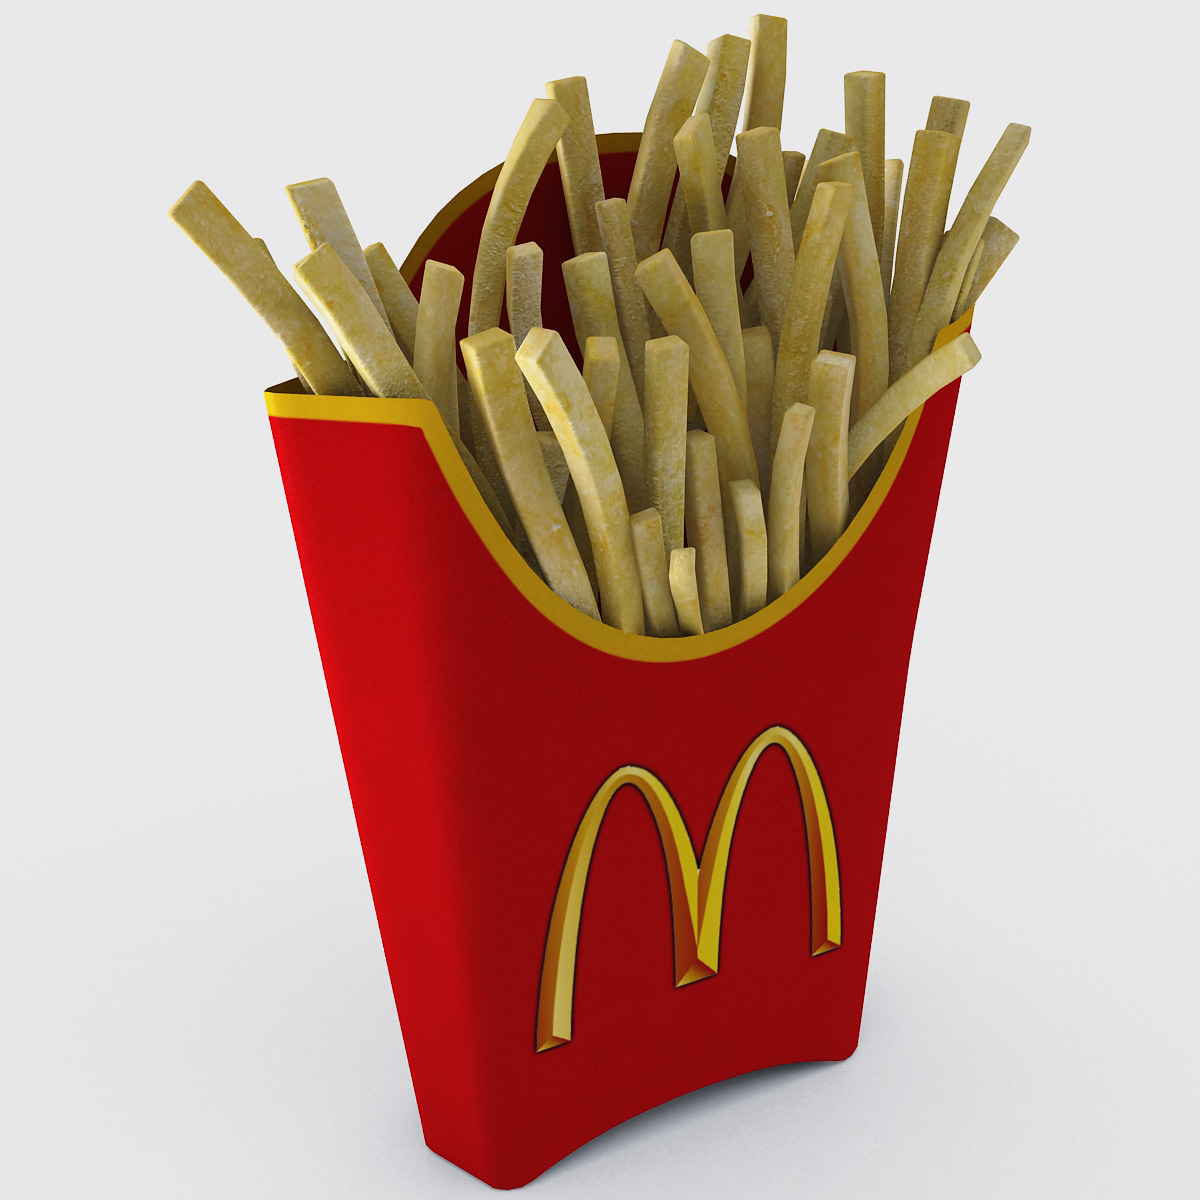 McDonalds_French_Fries_001.jpg